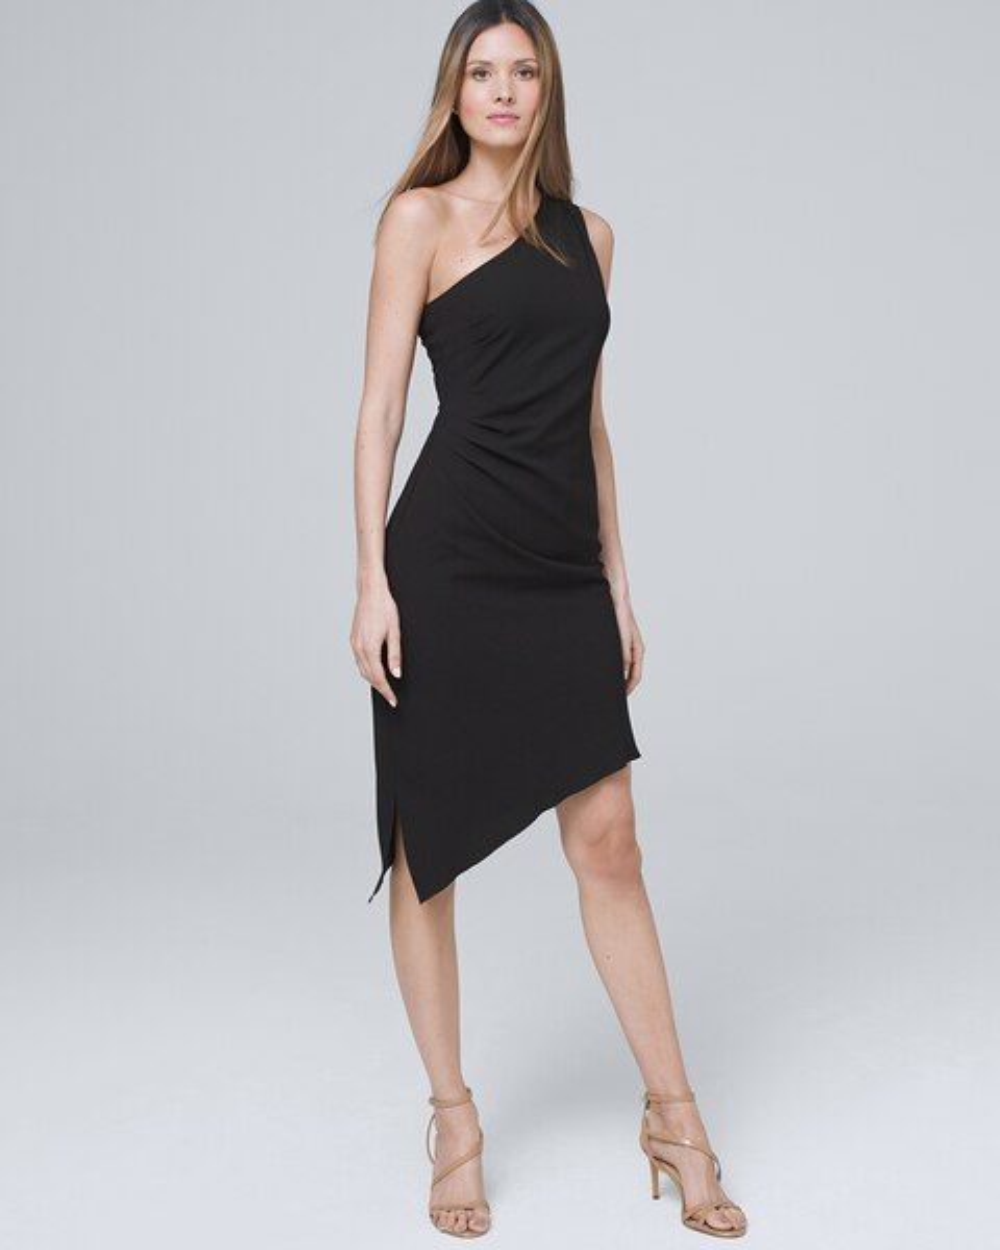 One Shoulder Black Asymmetrical Dress by Whbm